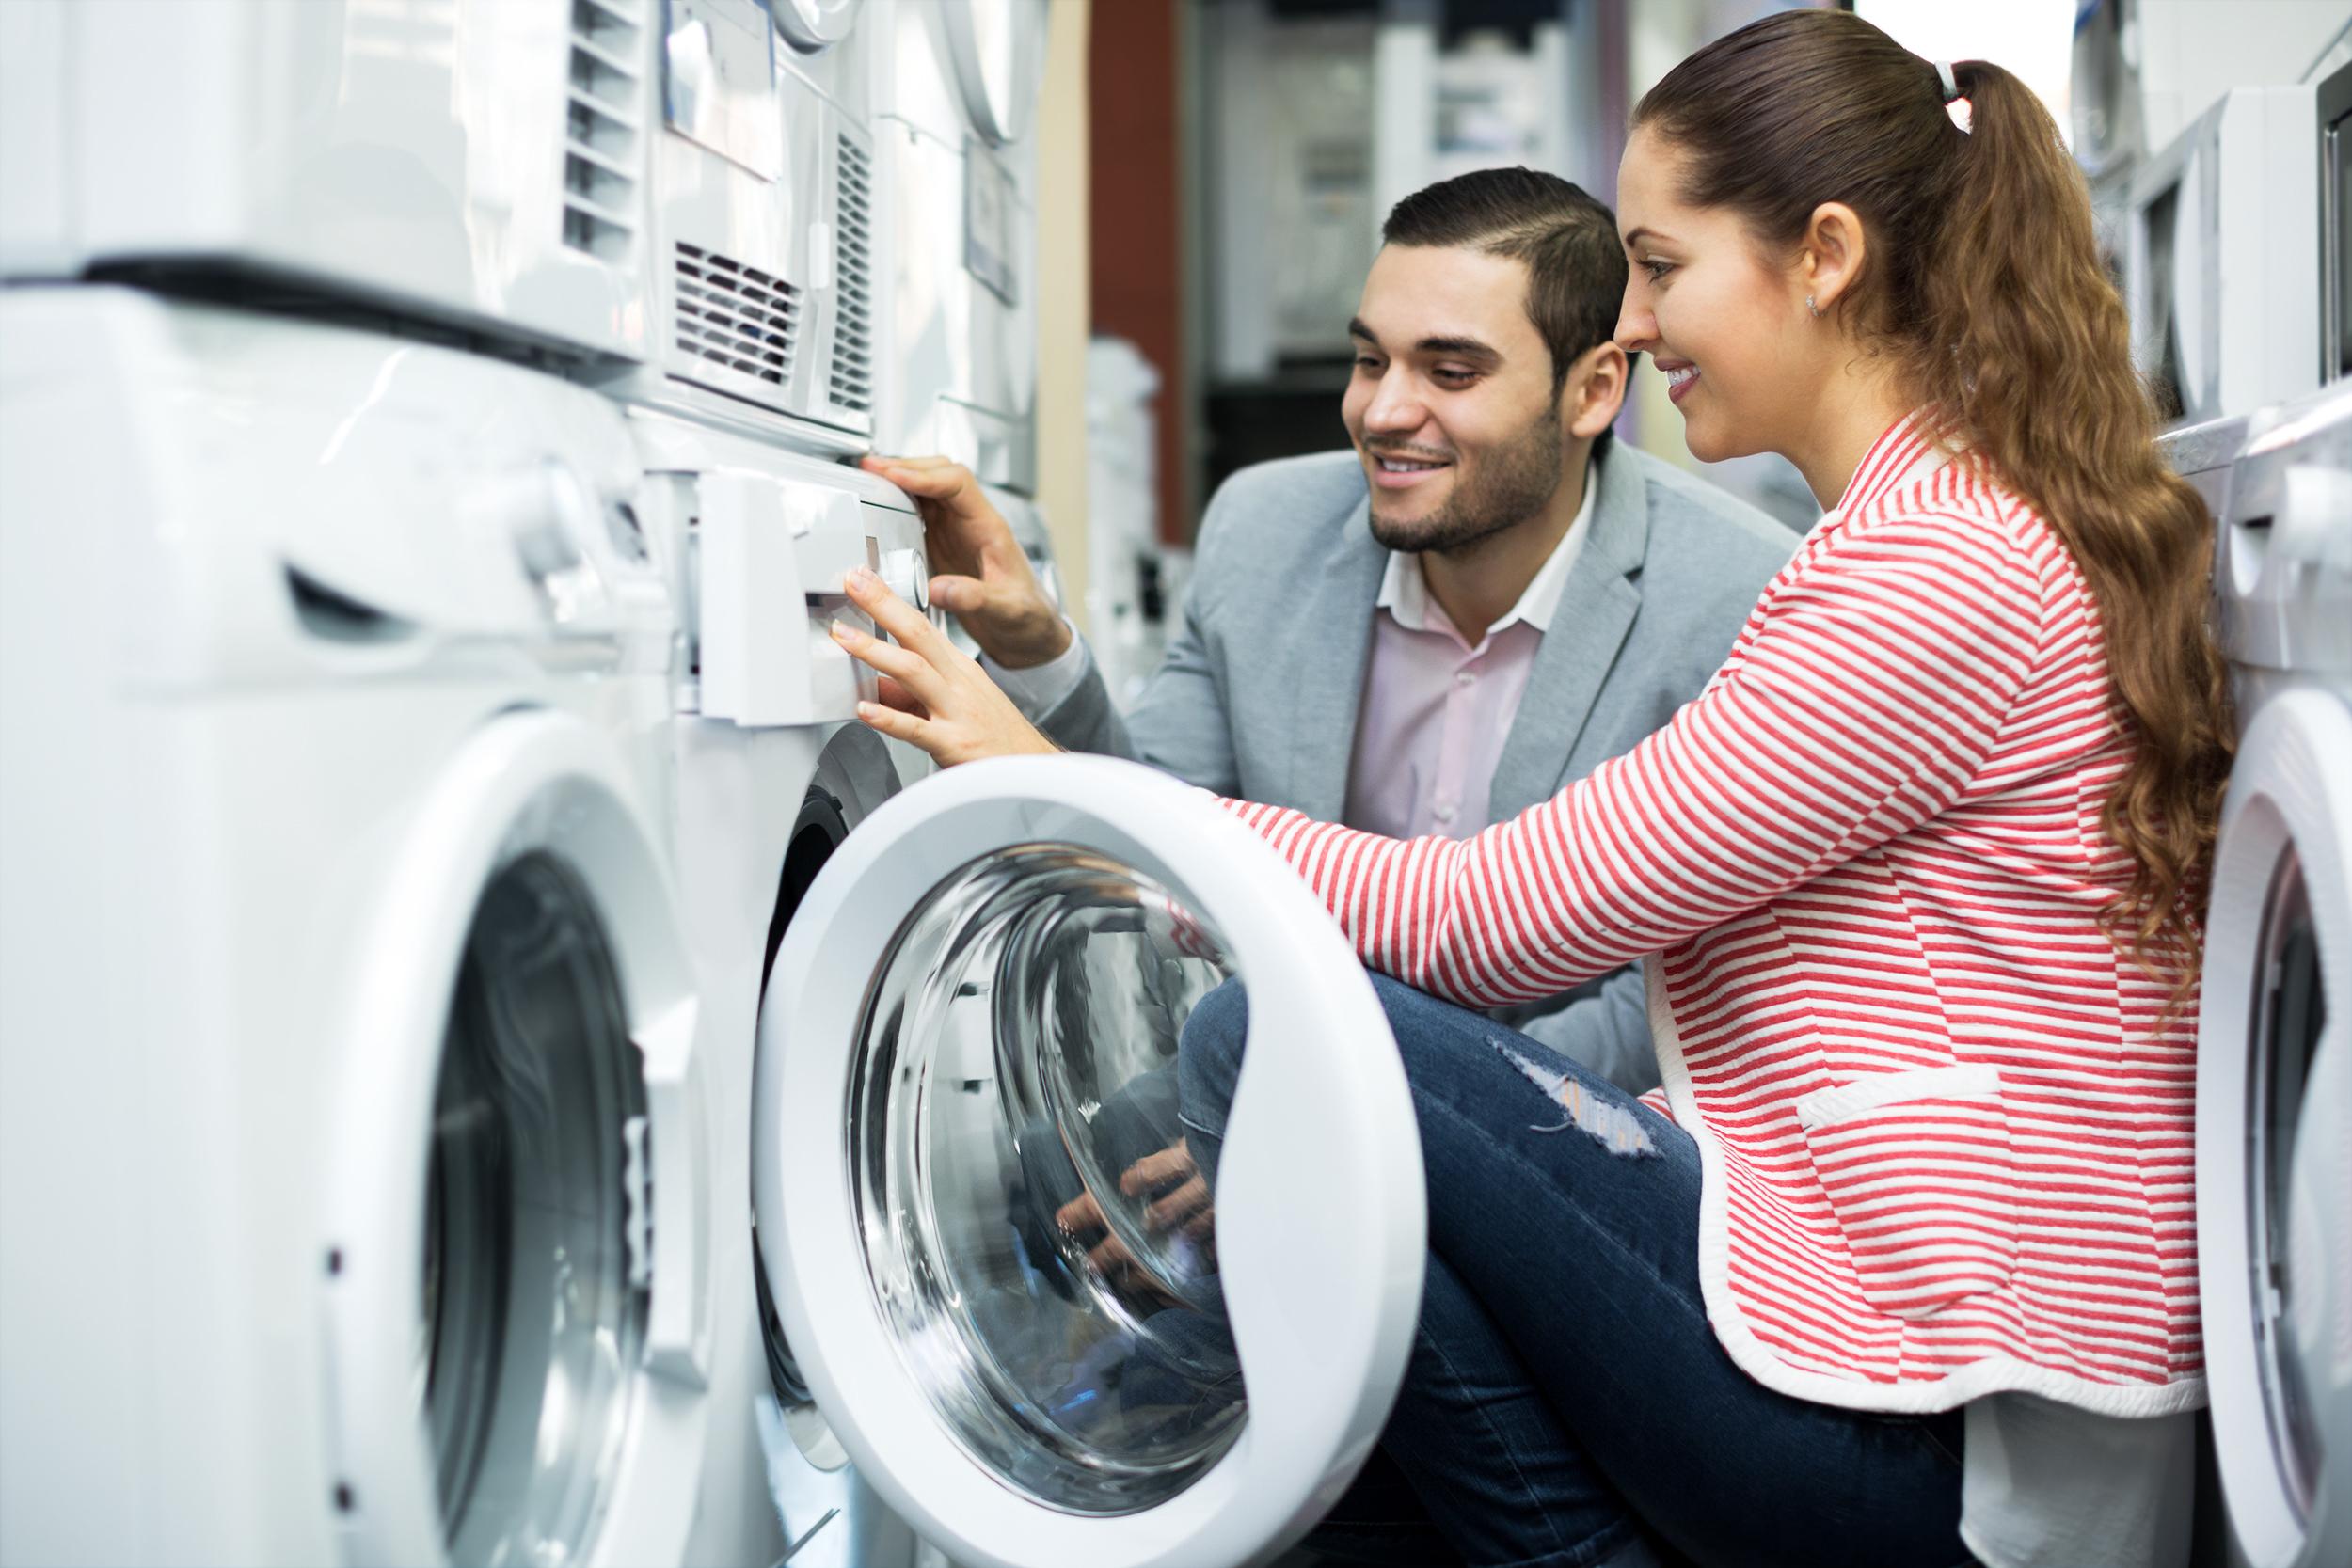 A woman and man look at washing machines